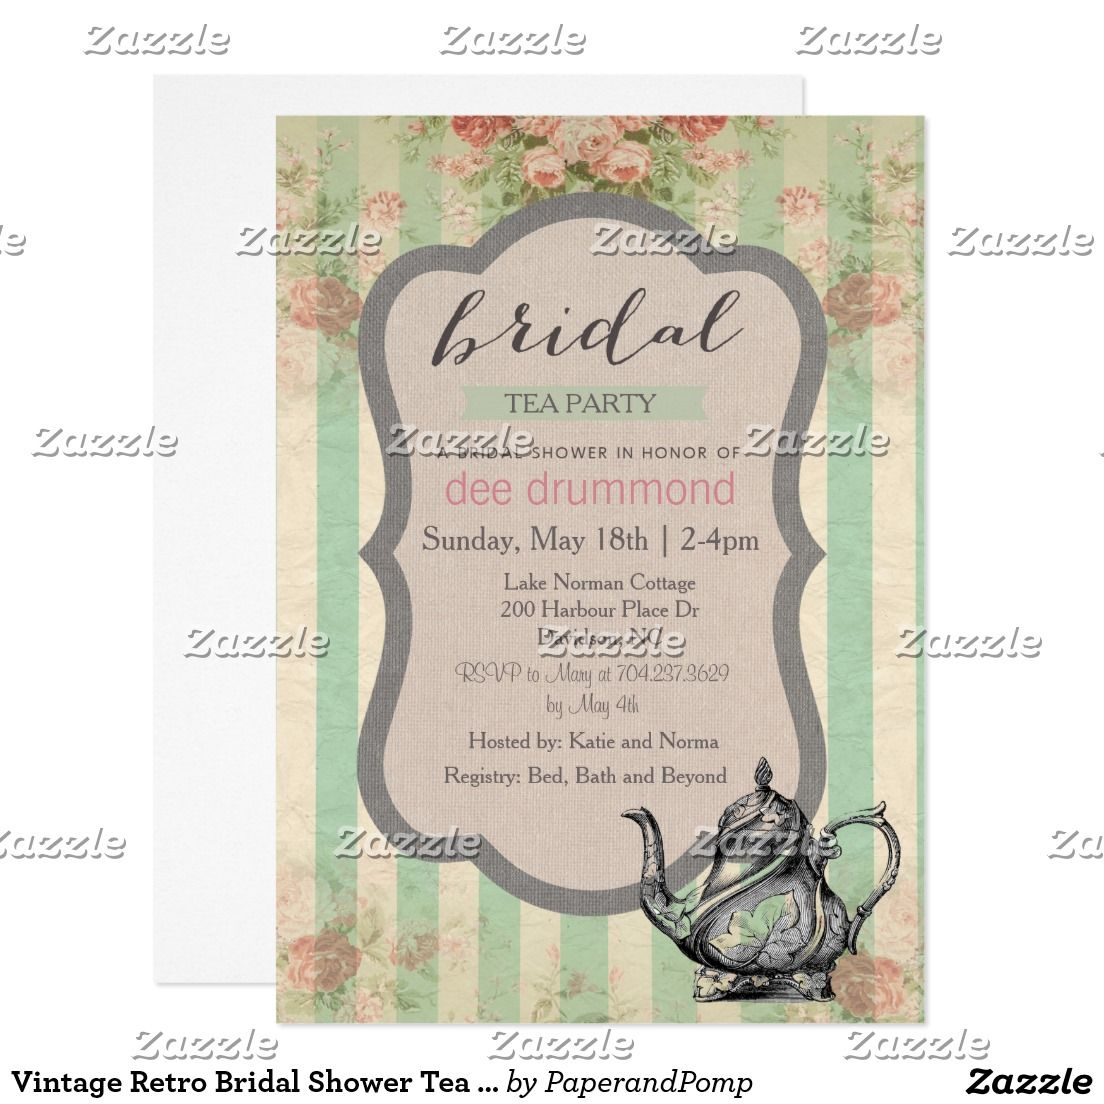 Vintage Retro Bridal Shower Tea Party Invitation Tea Party